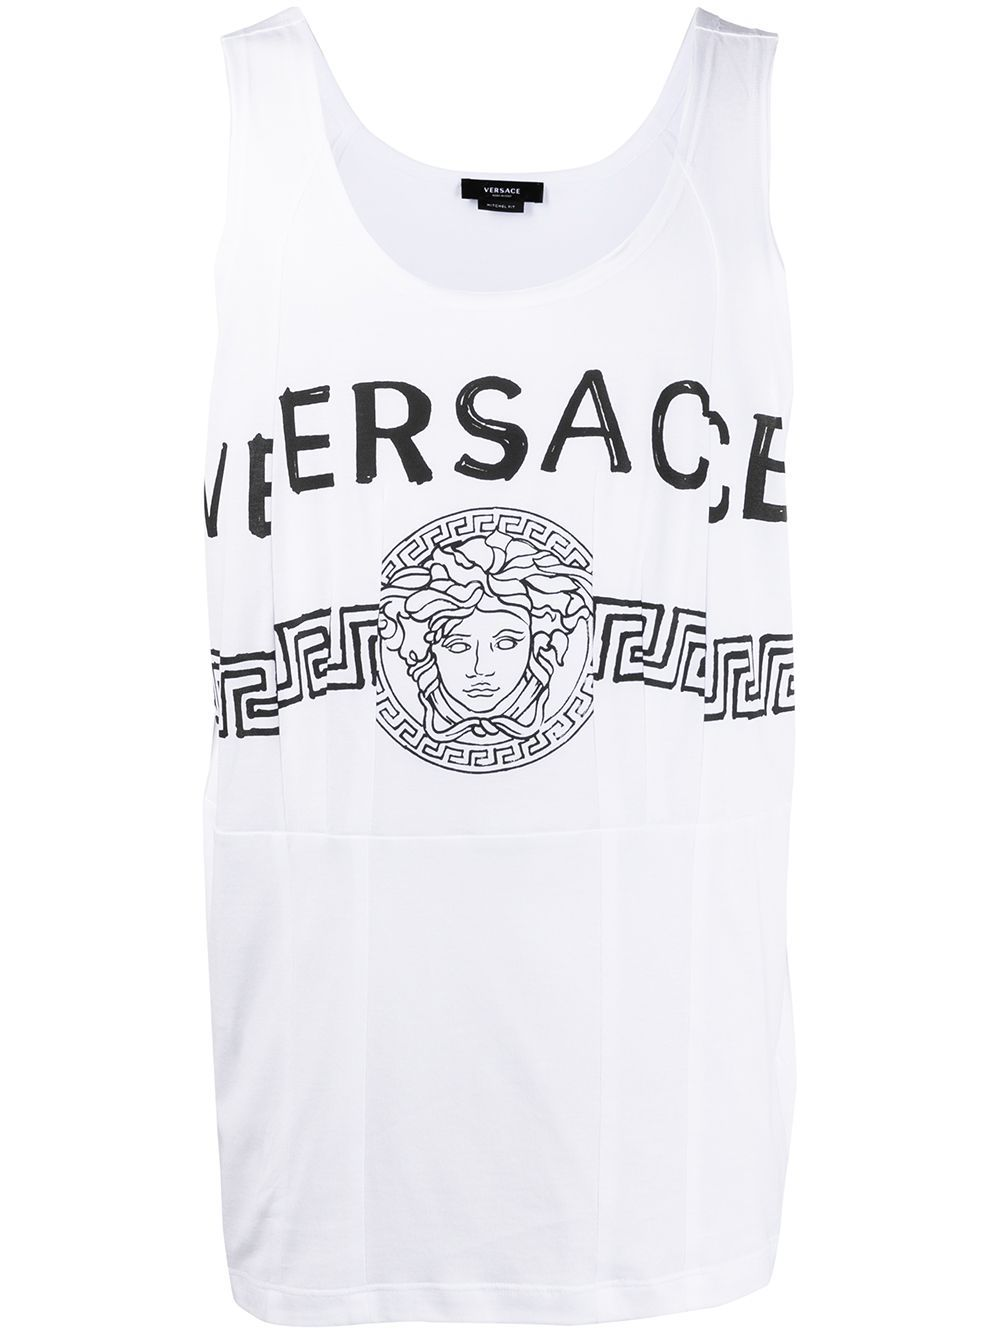 Versace VERSACE MEN'S WHITE COTTON T-SHIRT